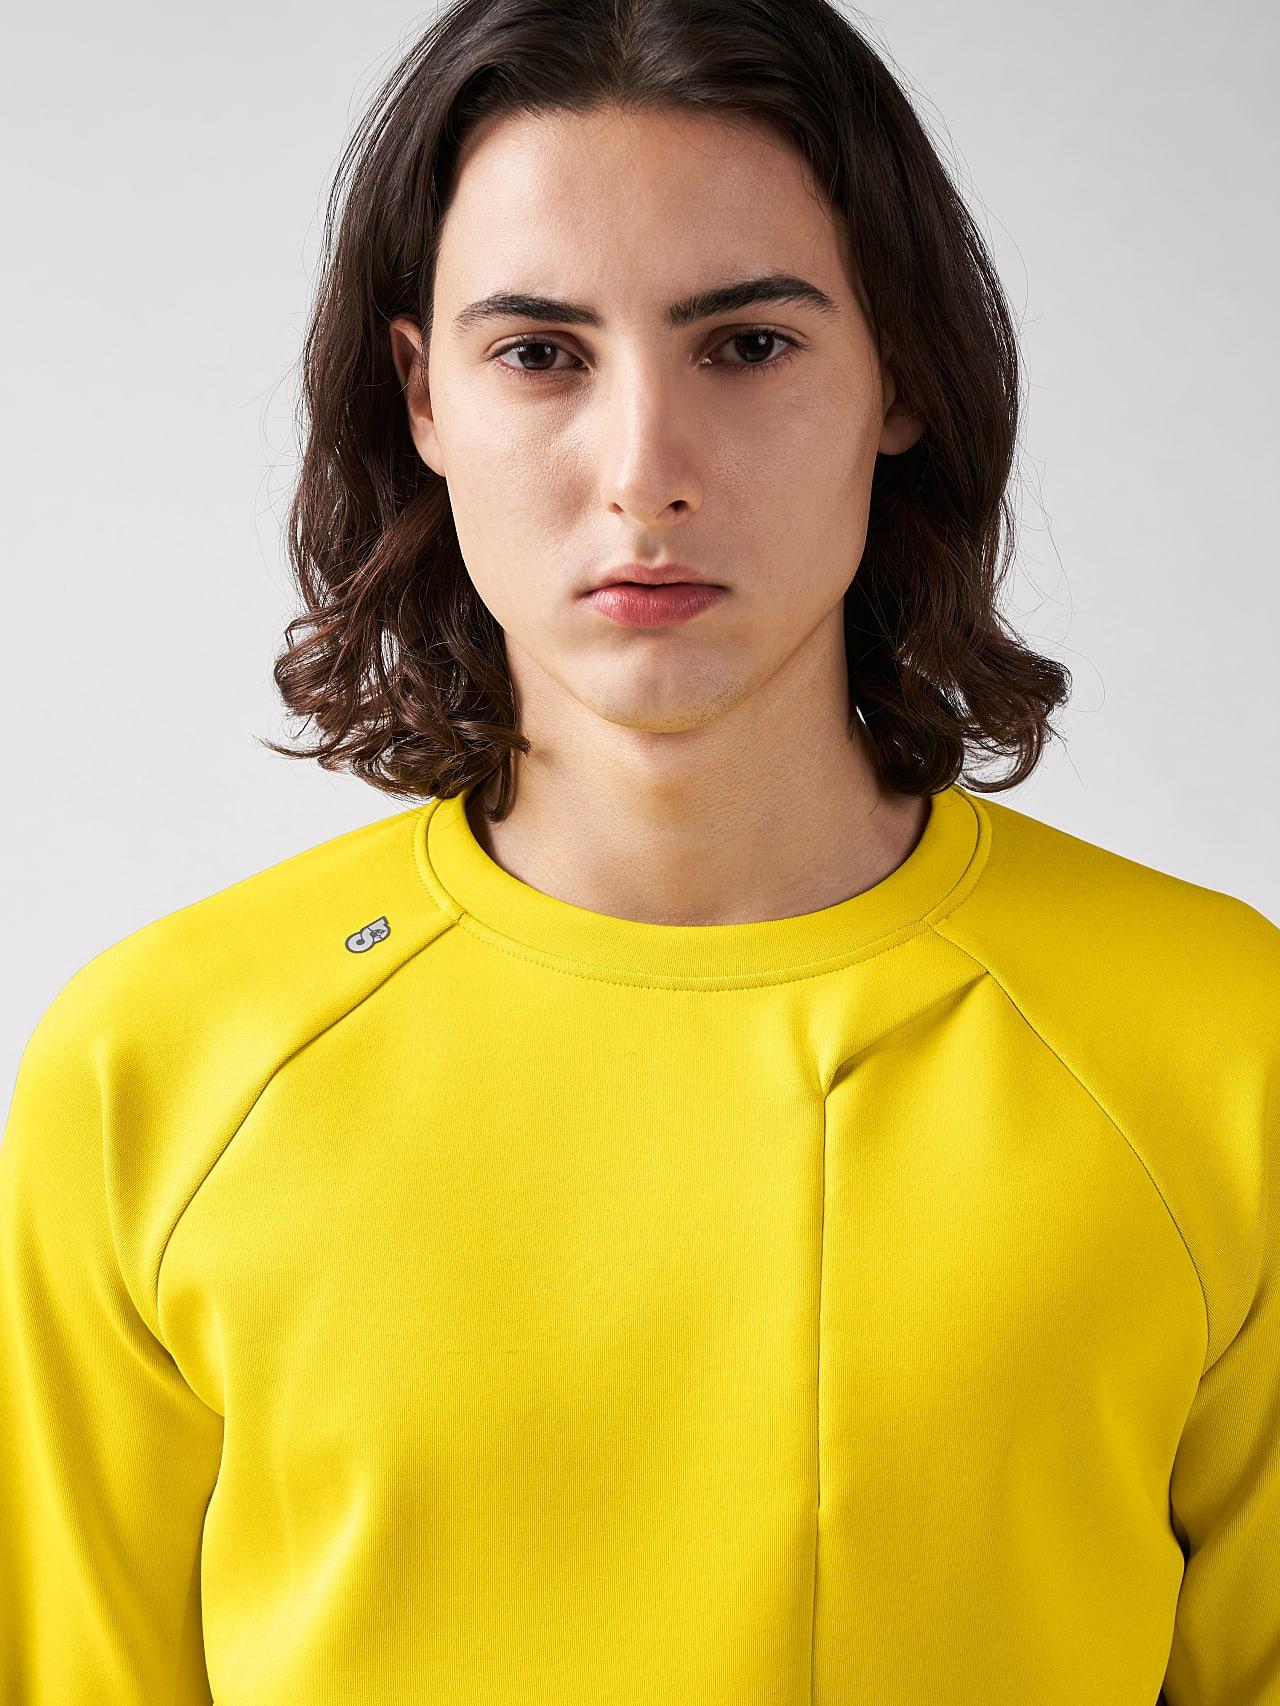 SUPRA V3.Y5.01 Technical Crewneck Sweater yellow Right Alpha Tauri